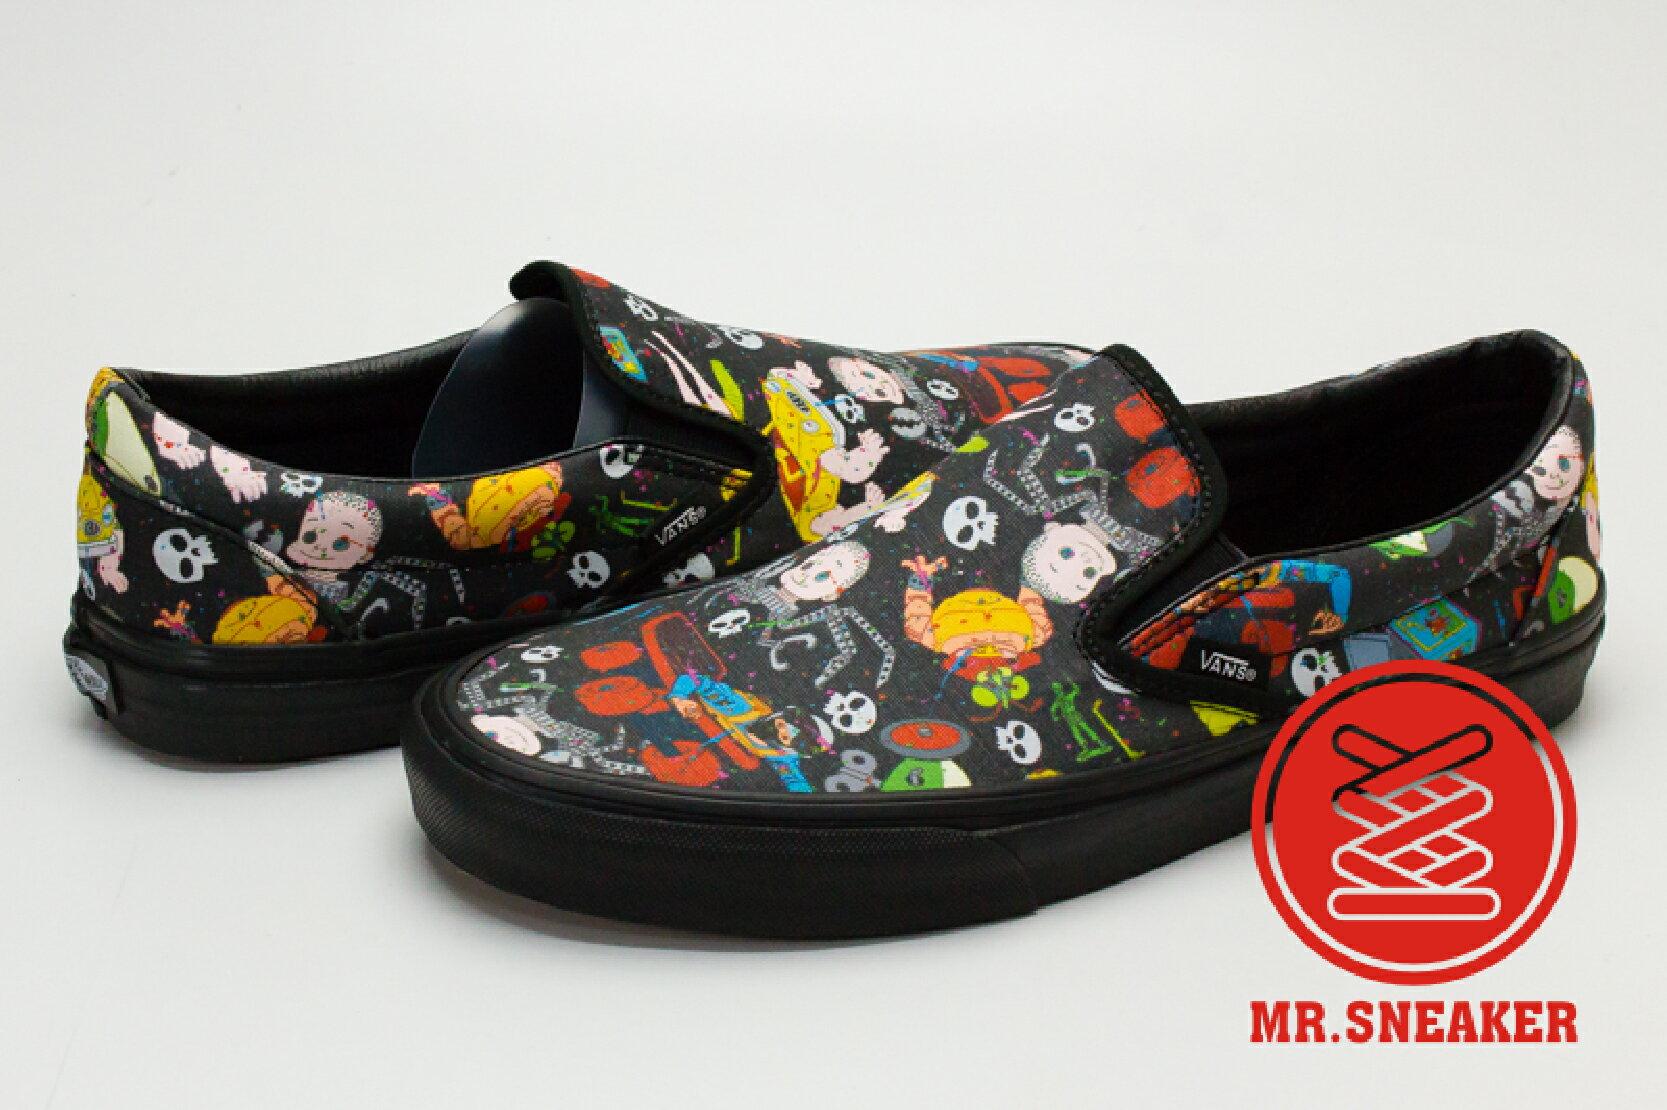 ☆Mr.Sneaker☆ VANS x Toy Story Slip-On 阿薛 Sid 怪怪玩具  黑 男女款